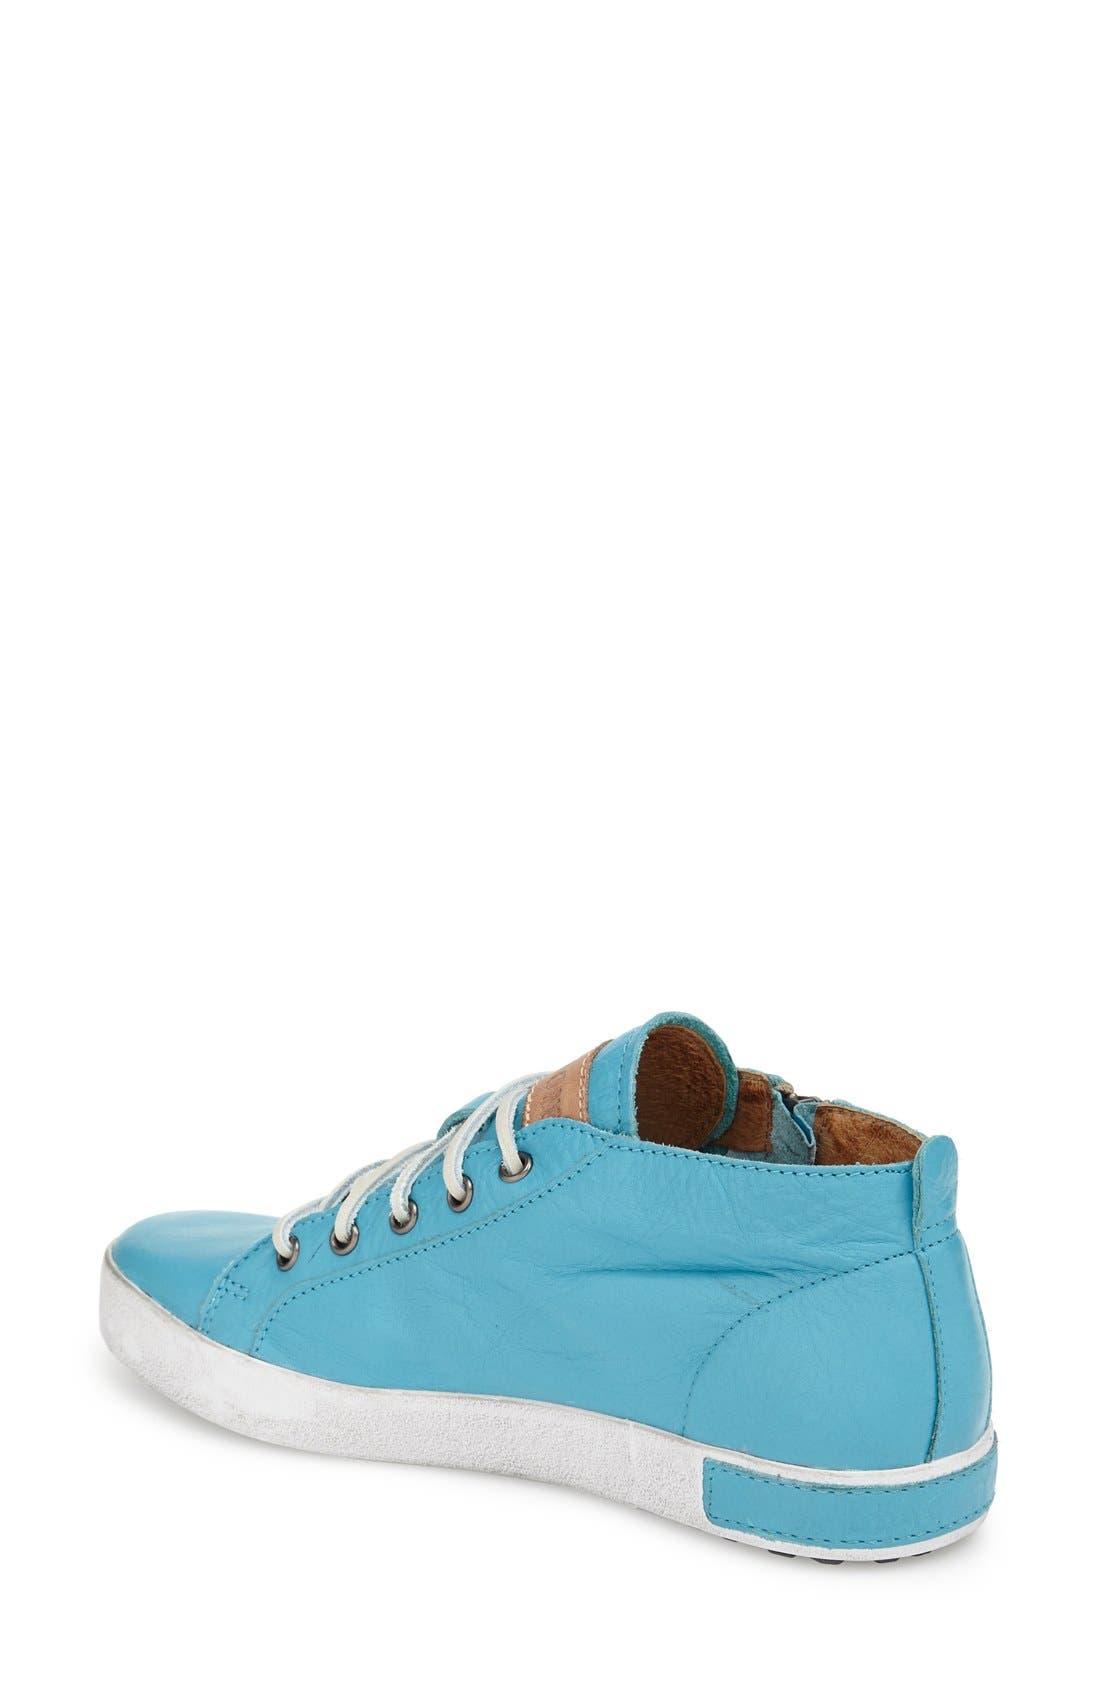 'JL24' Sneaker,                             Alternate thumbnail 2, color,                             Laguna Leather